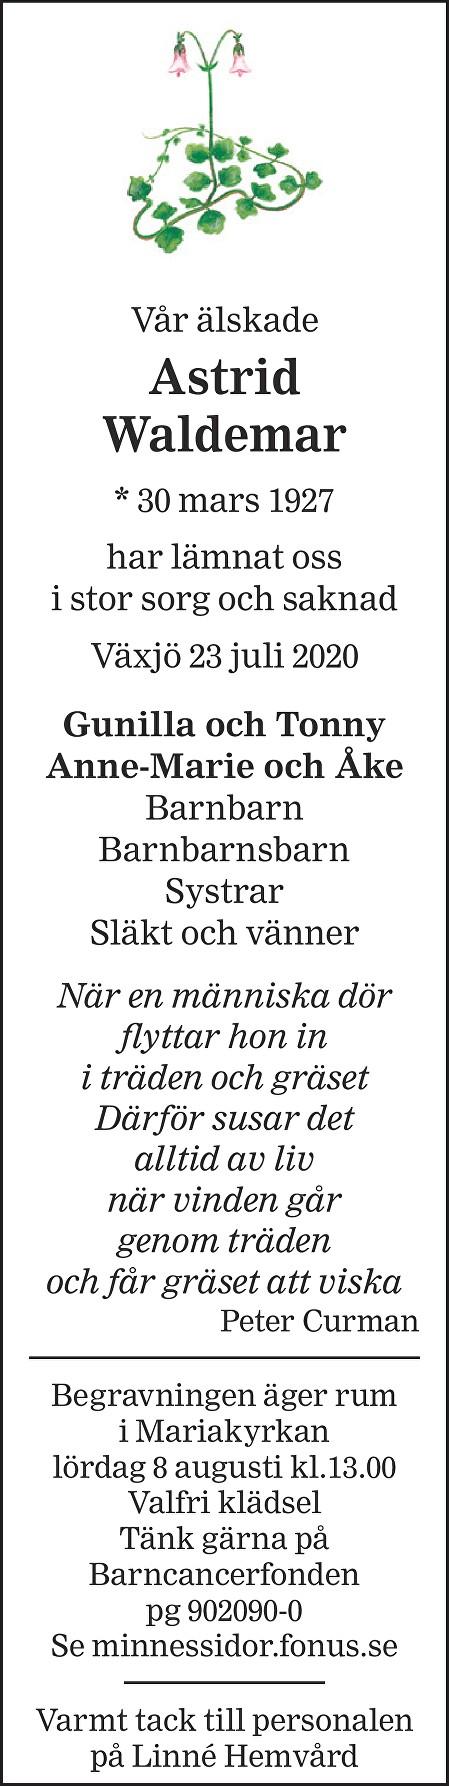 Astrid Waldemar Death notice